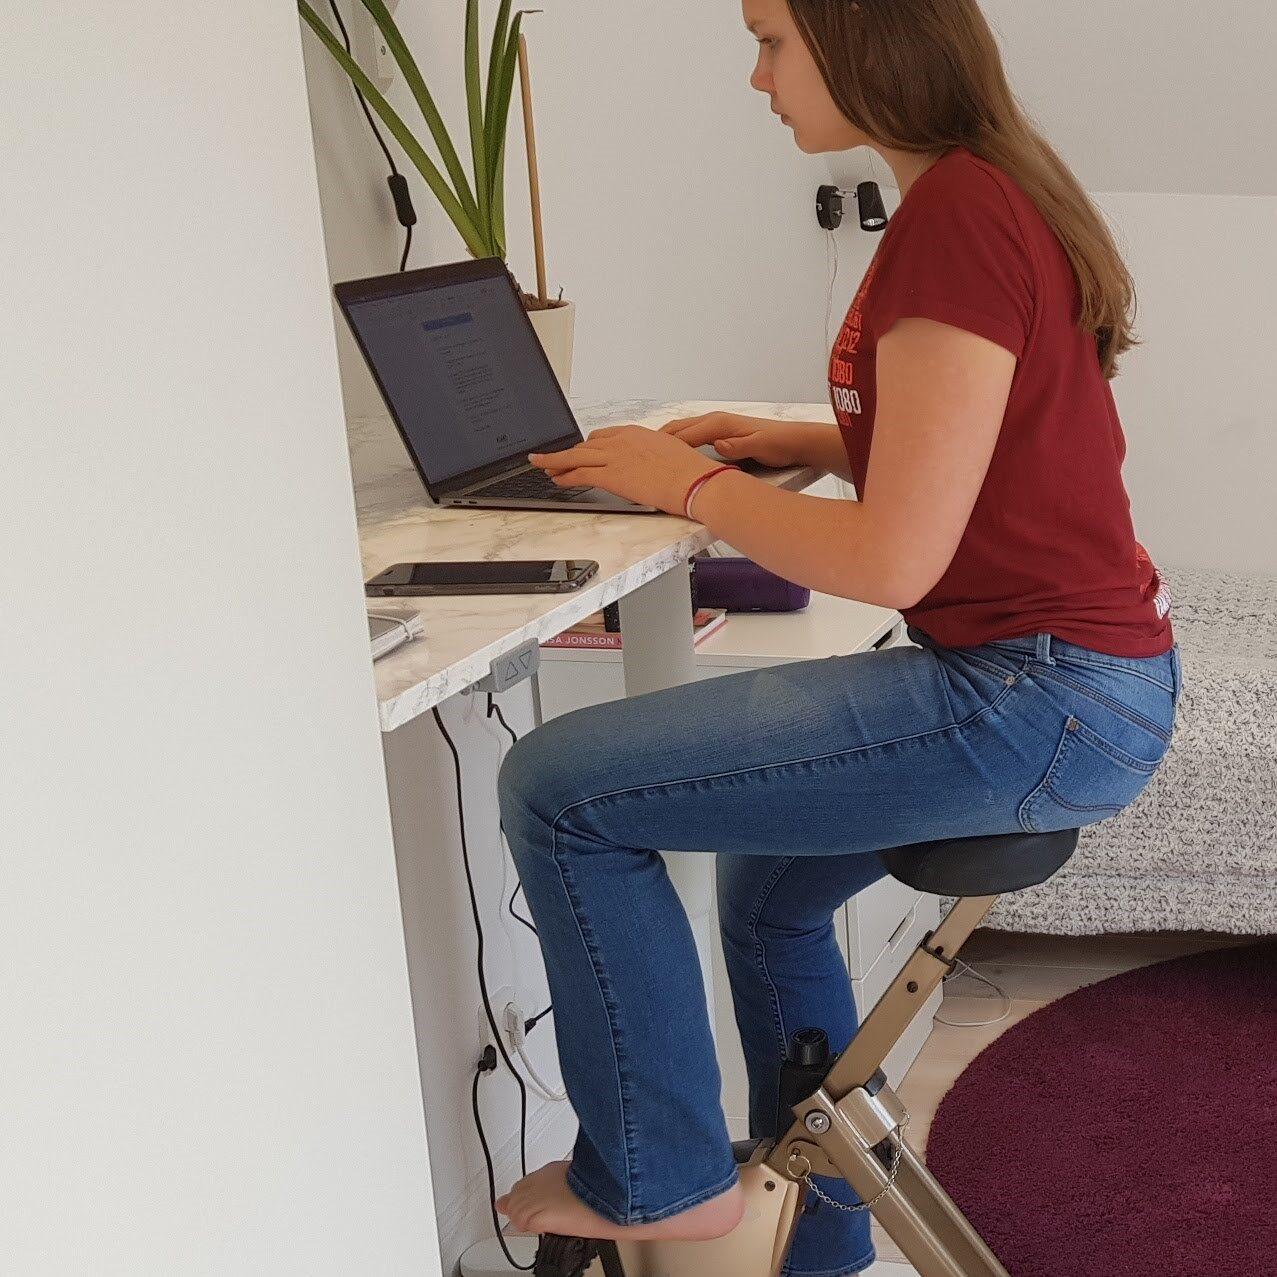 SportOffice home deskbike study